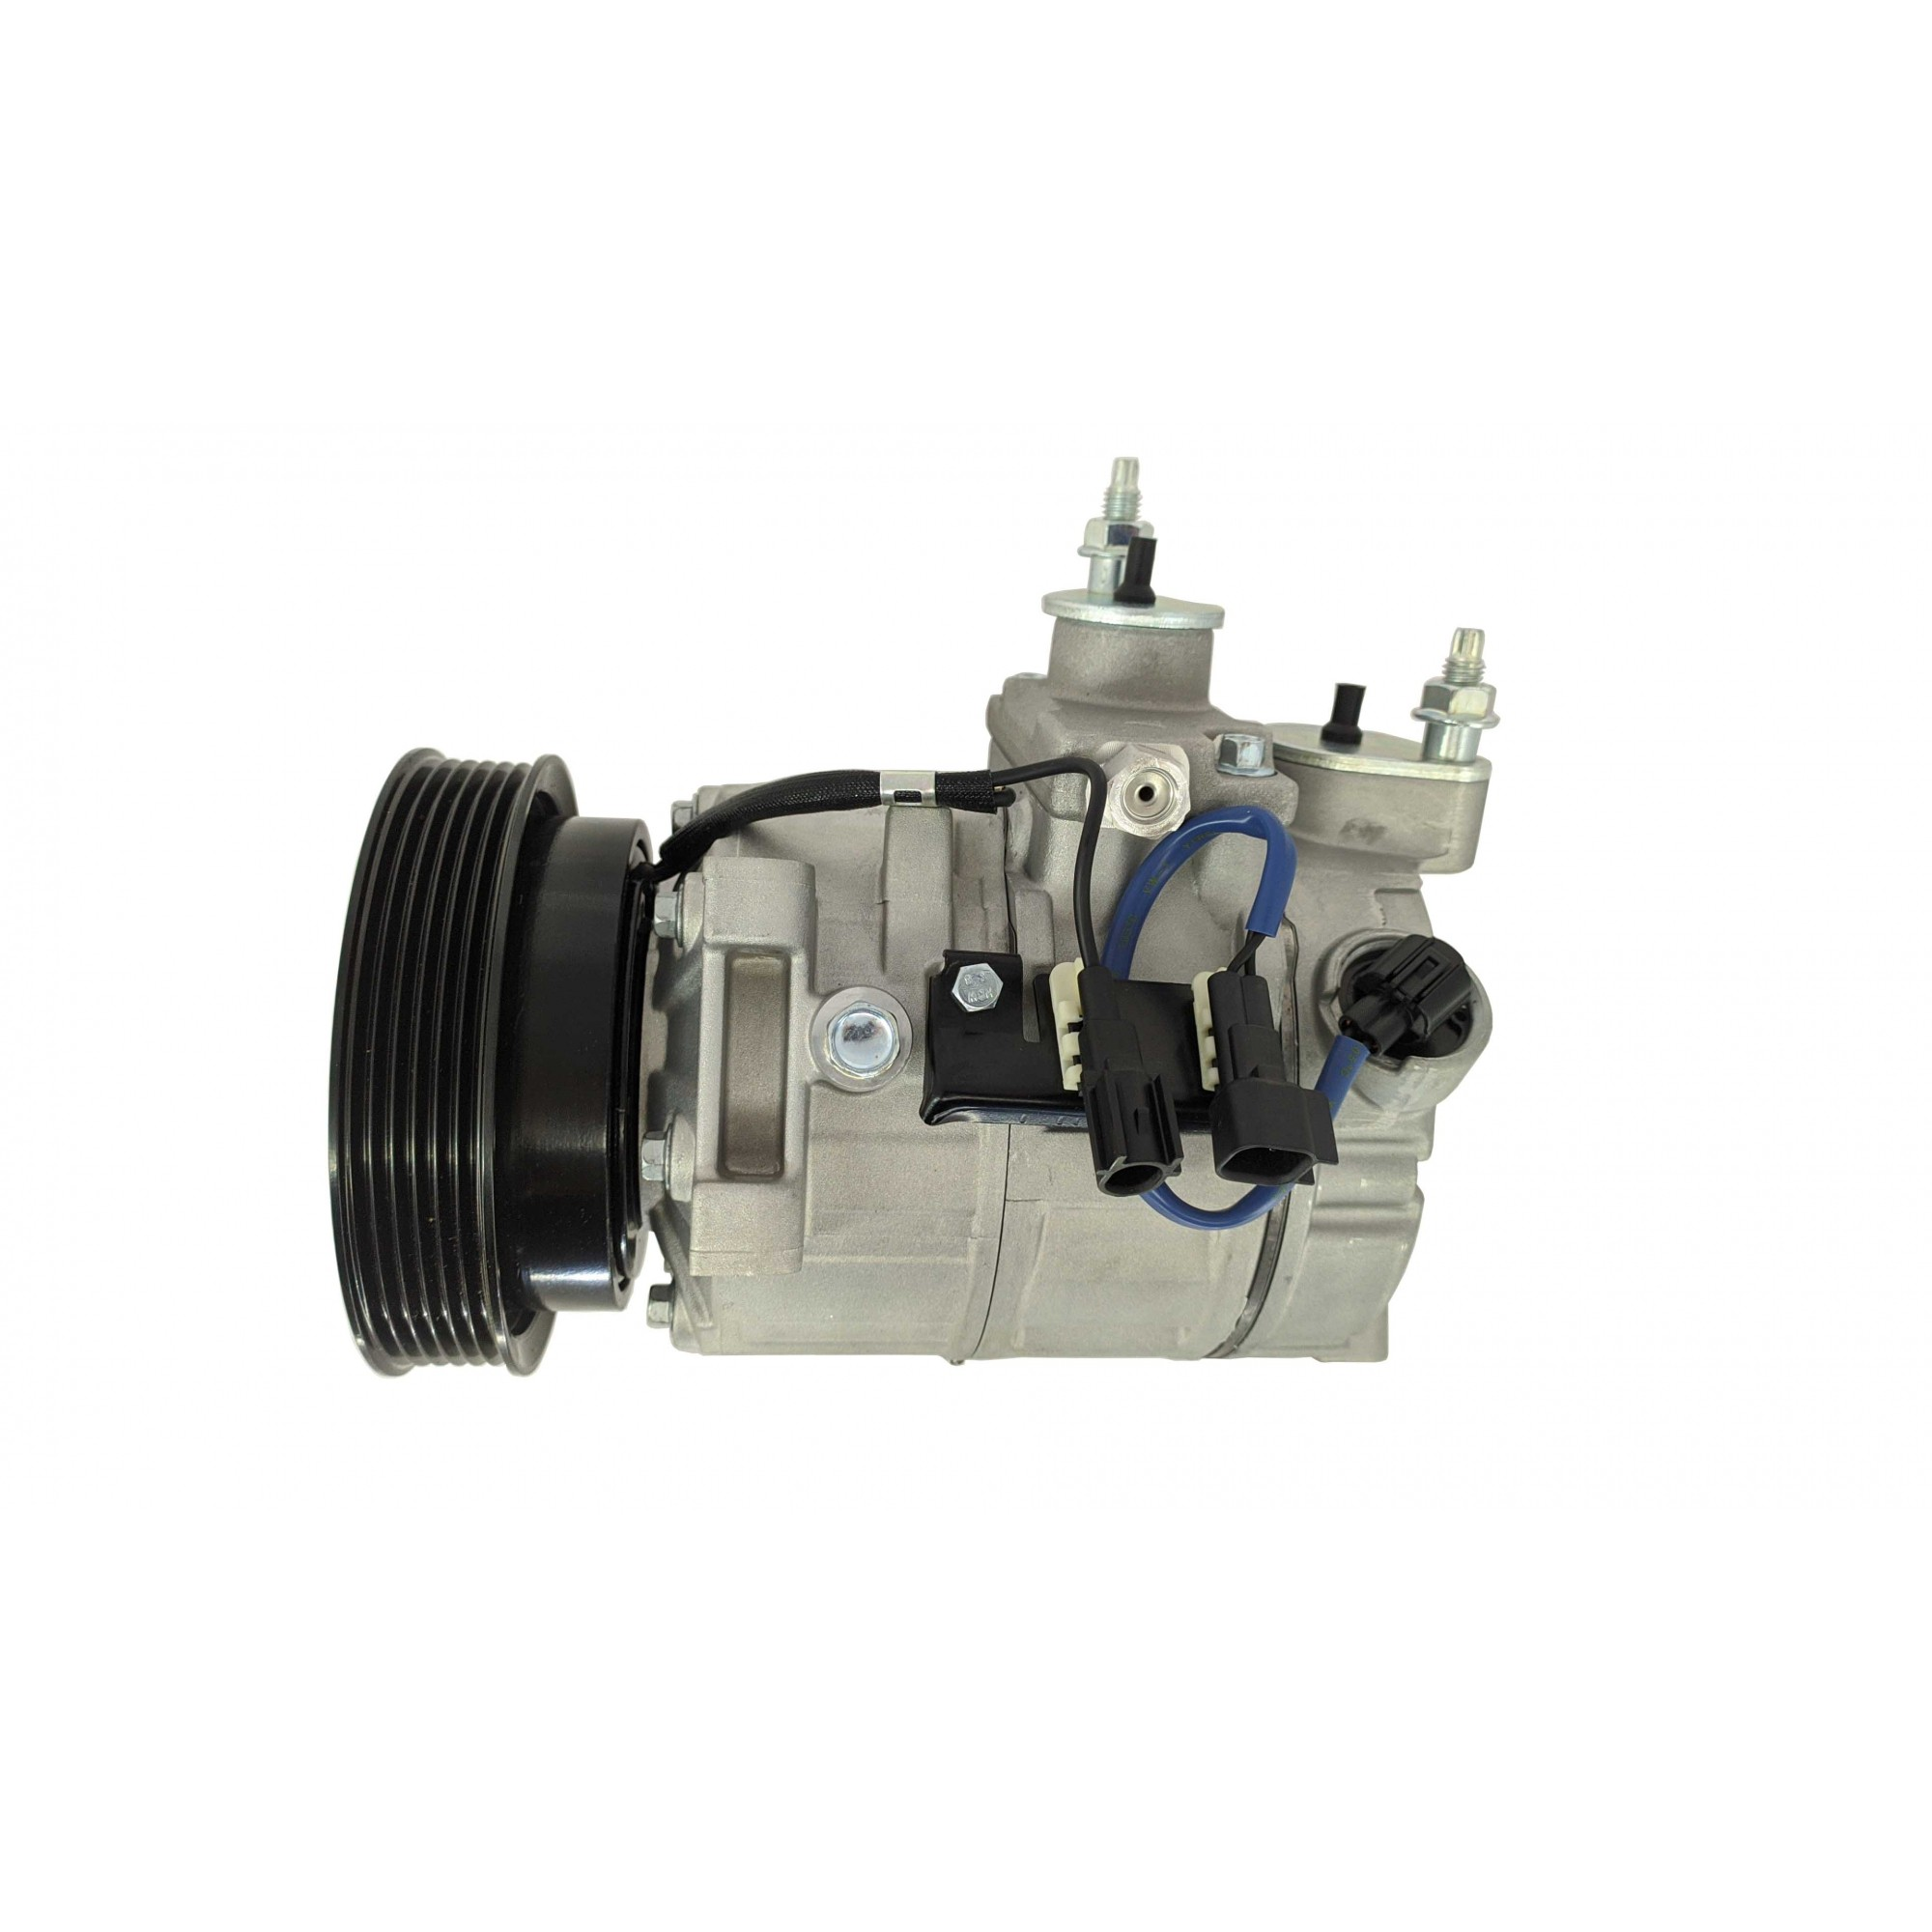 Compressor Freelander / Volvo Xc60